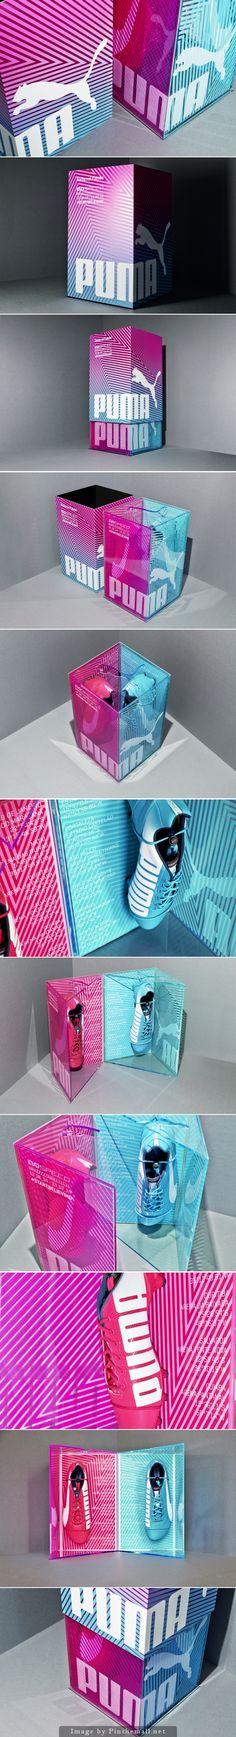 Puma #FIFA World Cup™ 2014 Tricks Collection #packaging #verpakking. http://www.boxerbranddesign.com/blog/